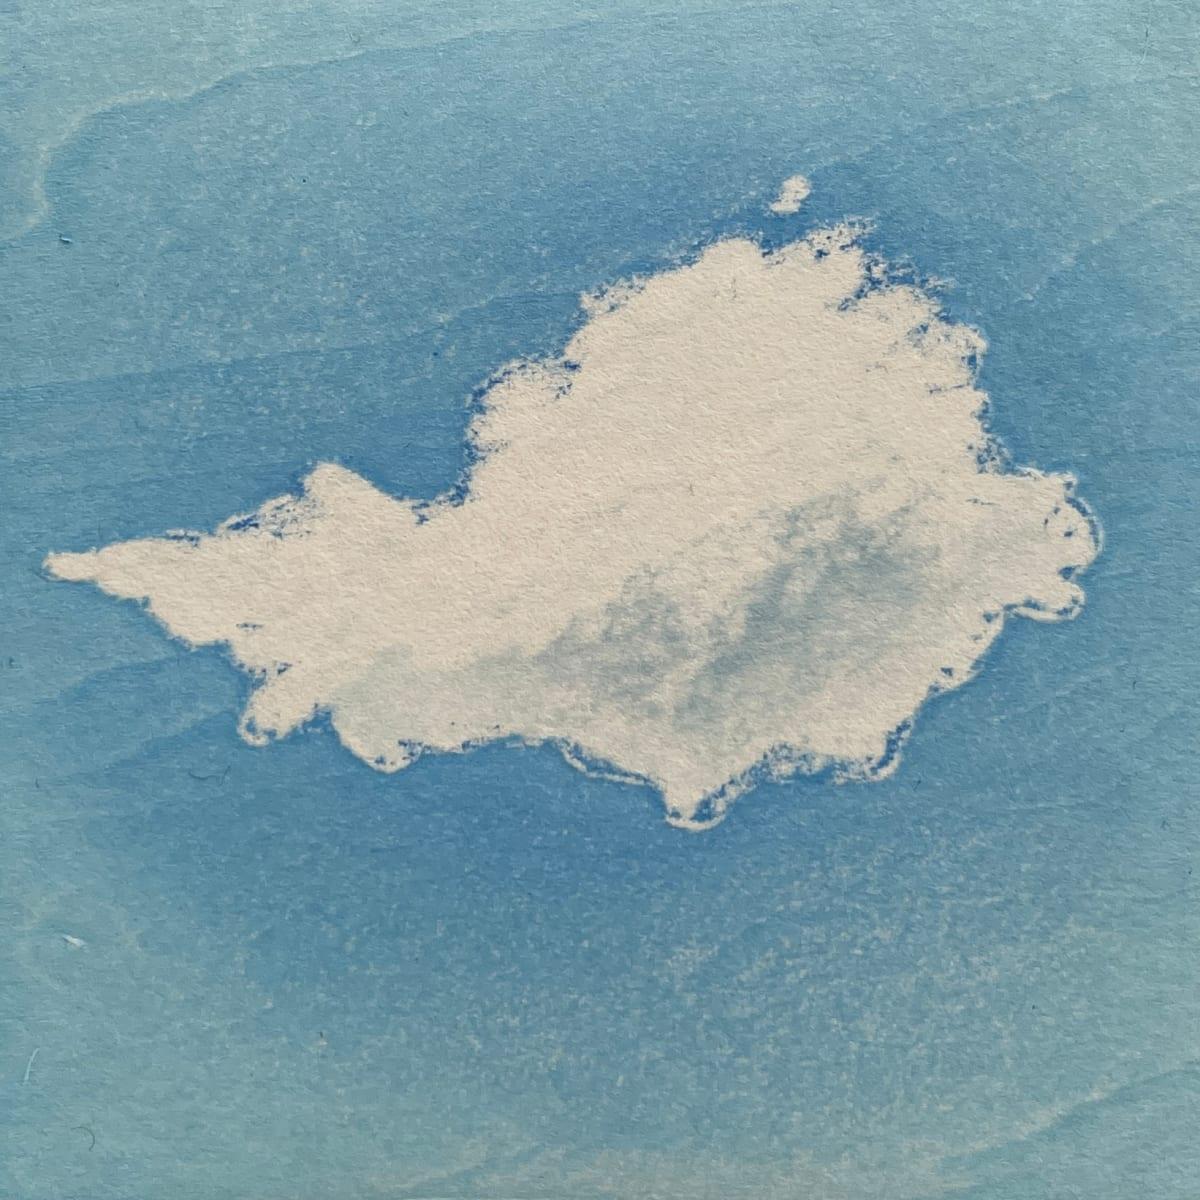 Silver lining #11 by Mara Cozzolino